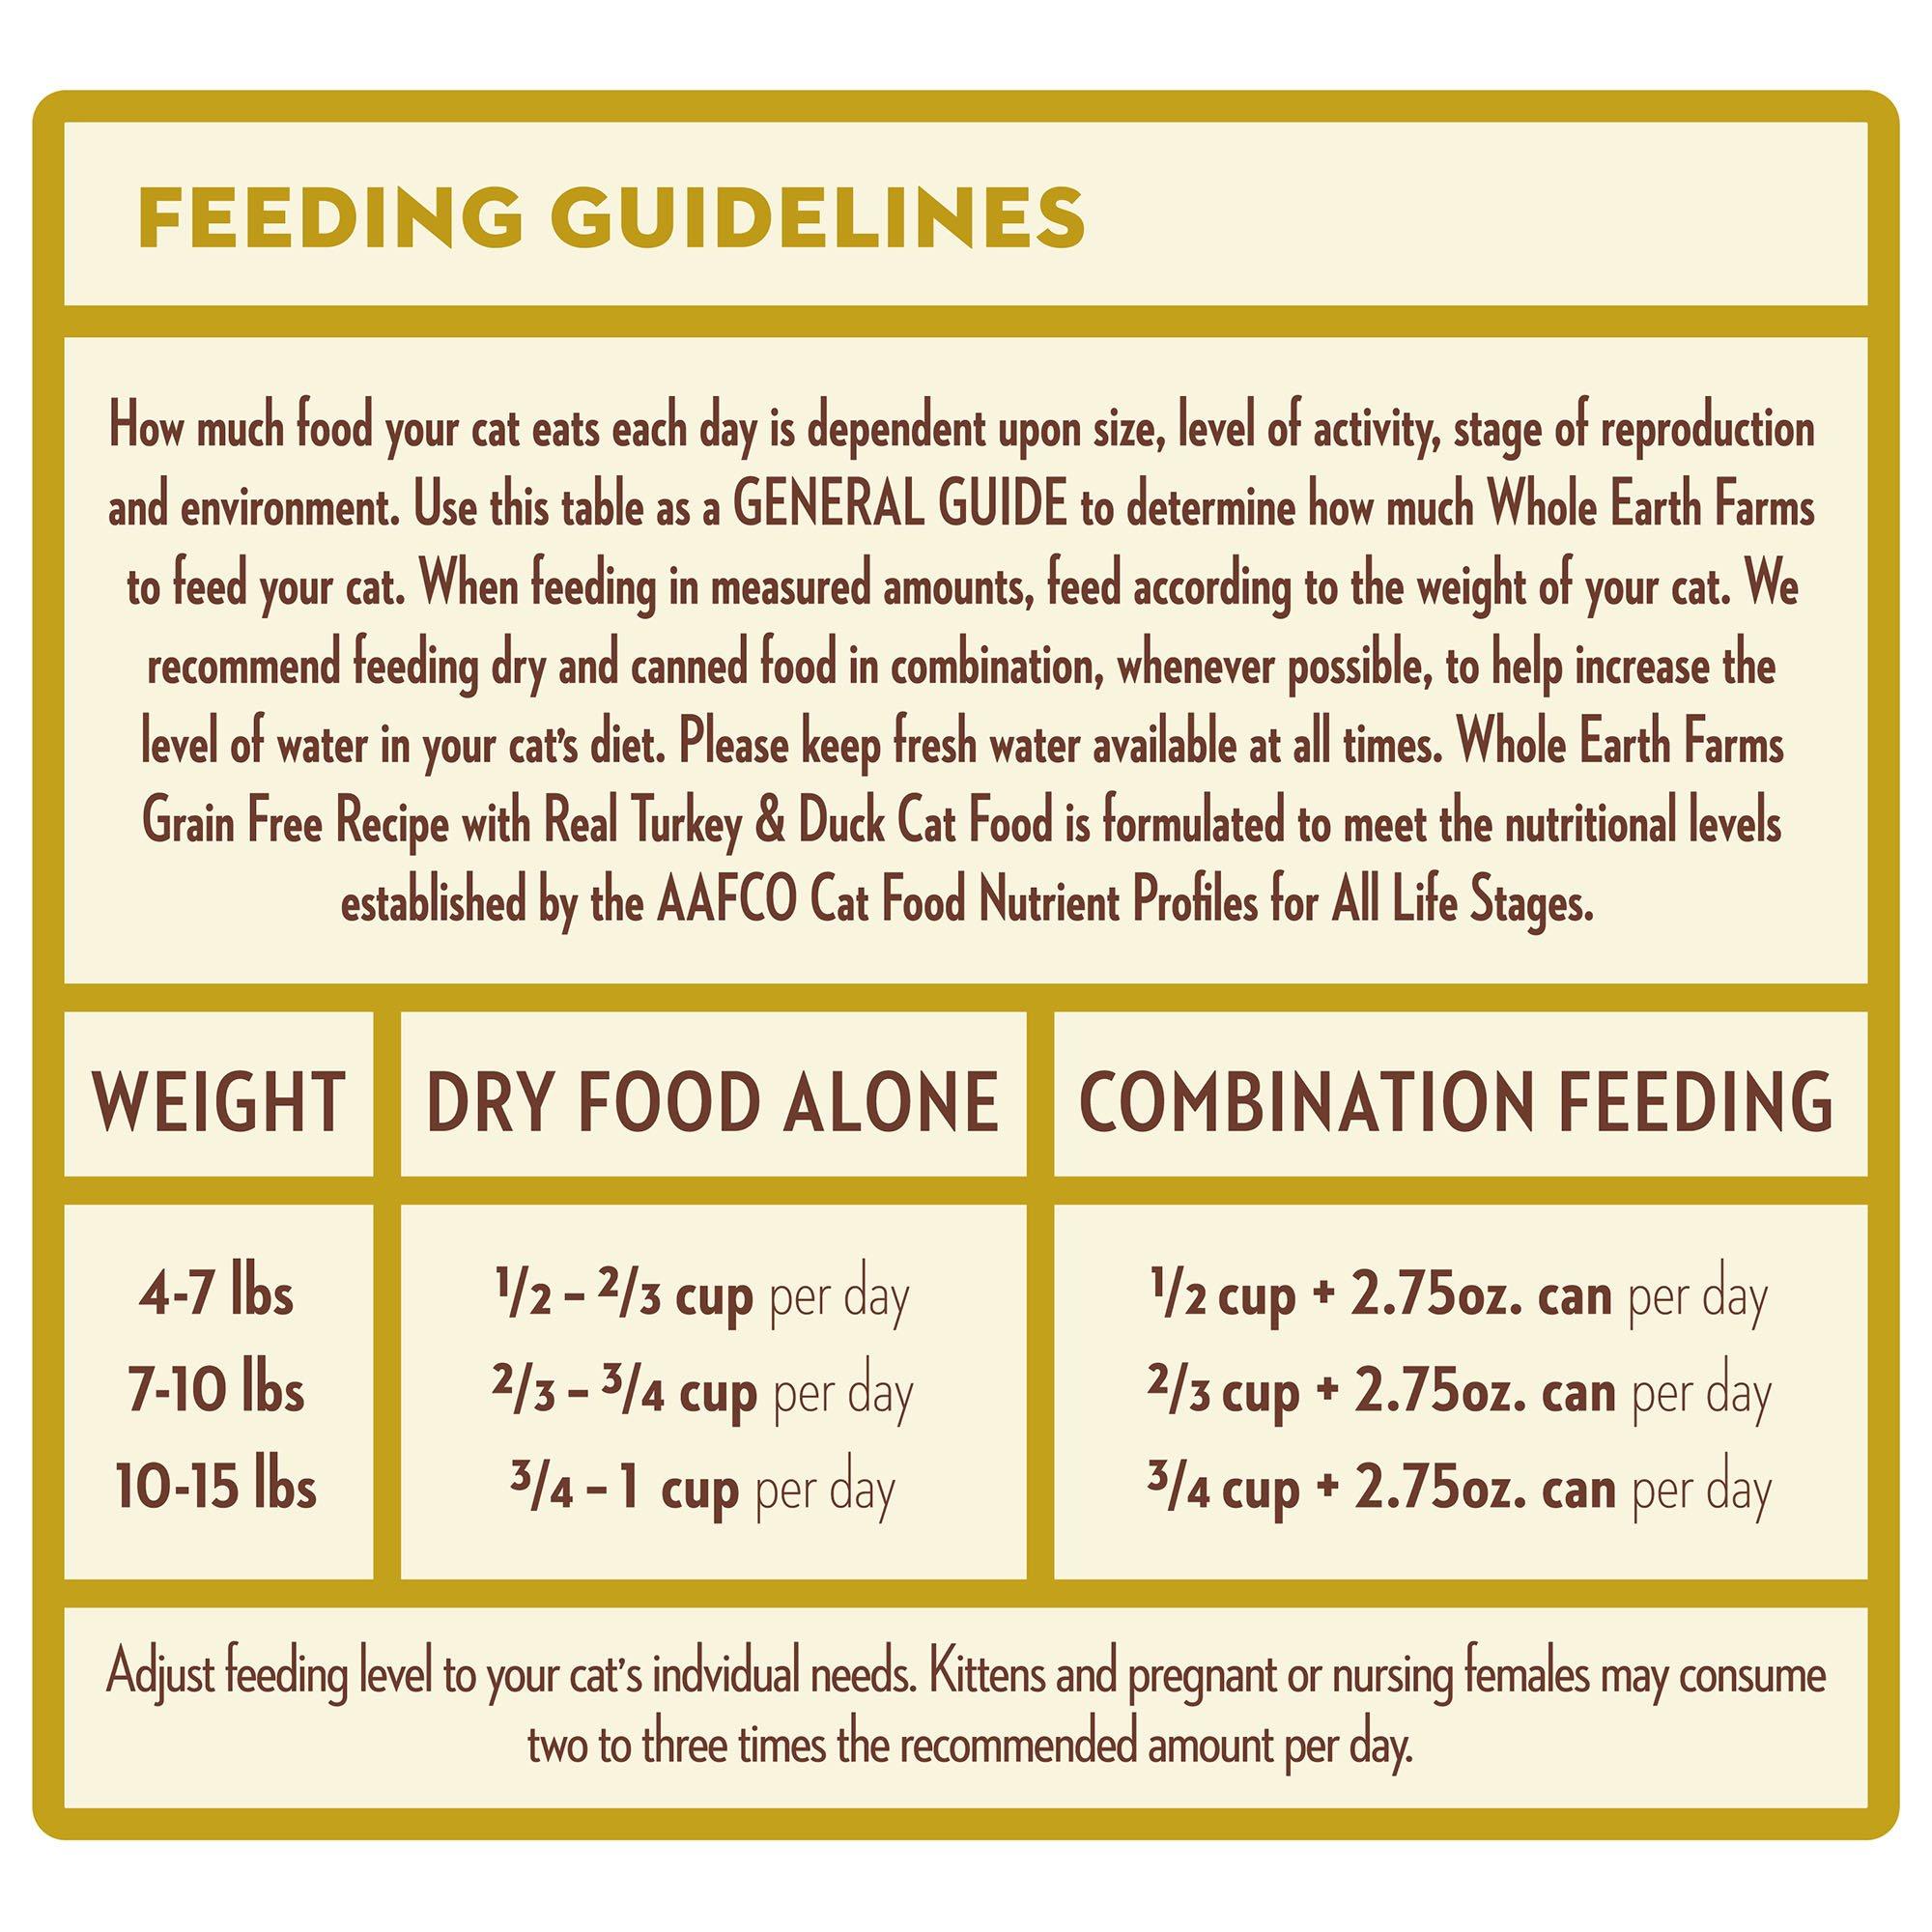 Whole-Earth-Farms-Grain-Free-Real-Turkey-amp-Duck-Cat-Food thumbnail 6